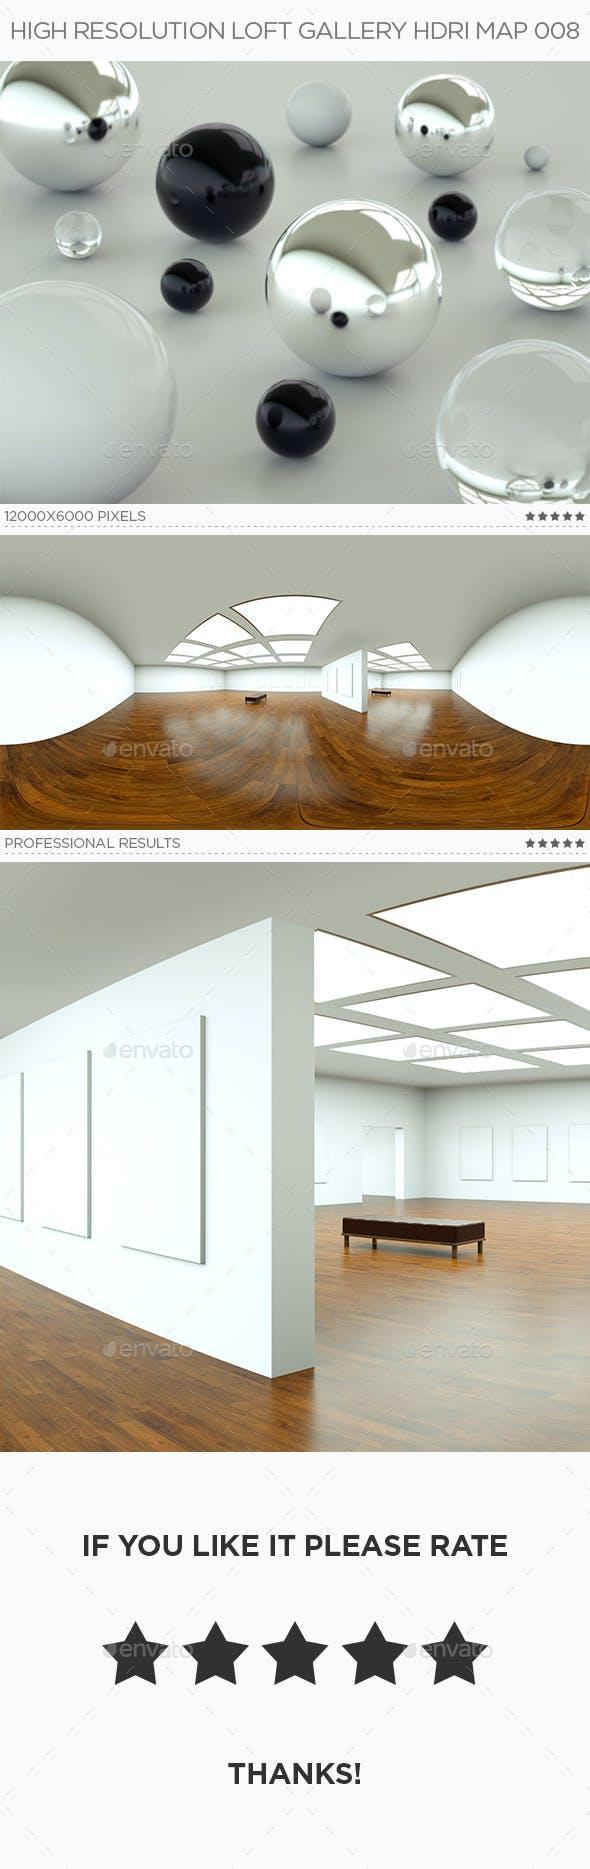 High Resolution Loft Gallery HDRi Map 008 - 3DOcean Item for Sale